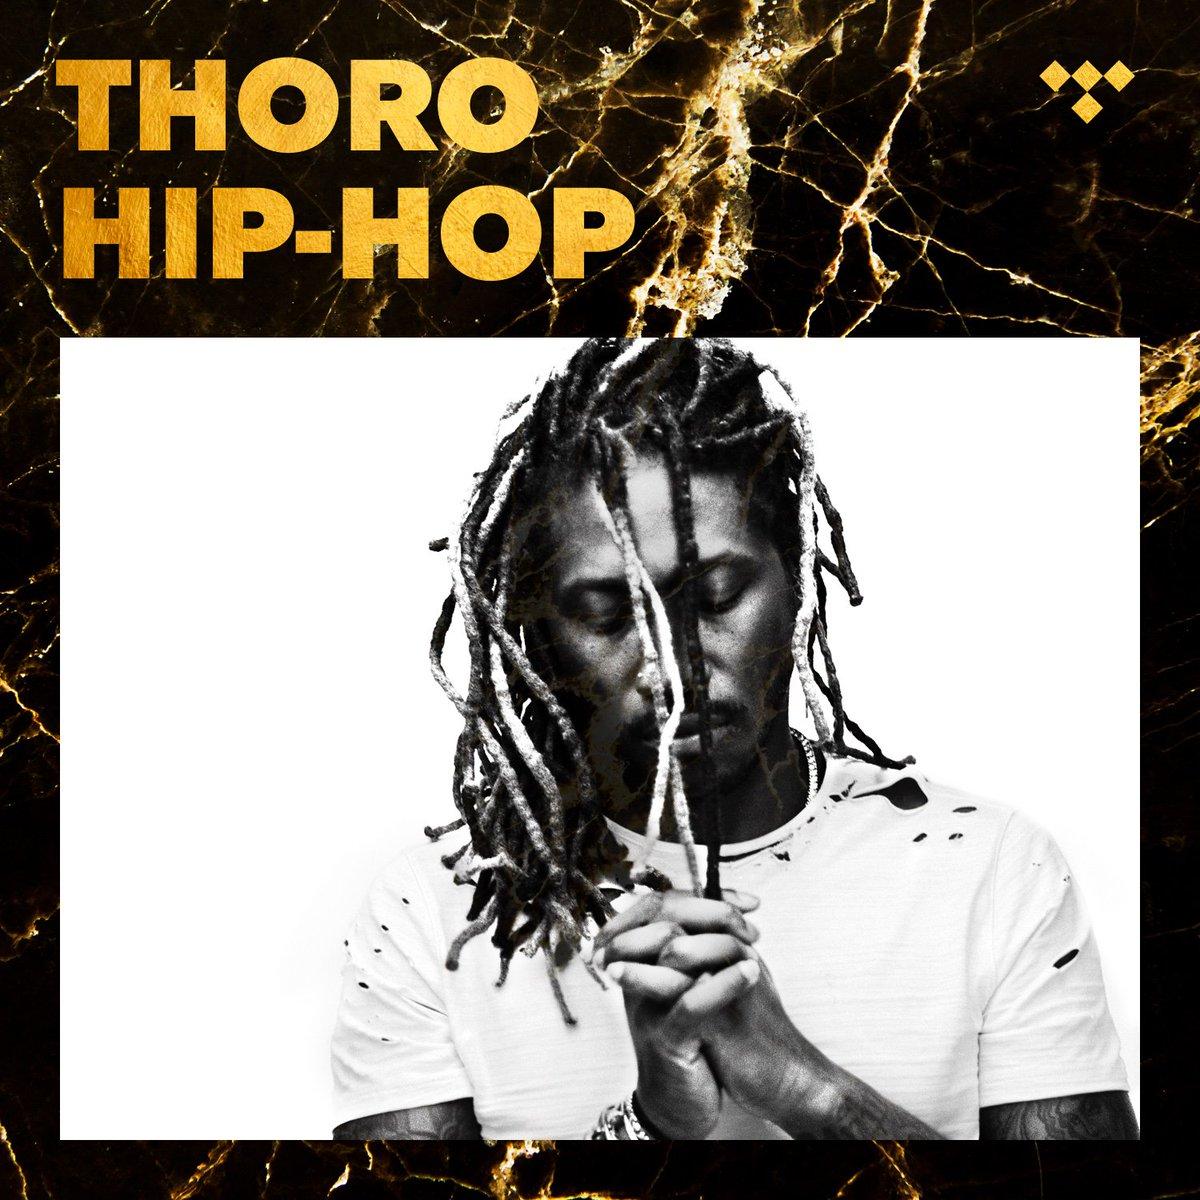 #Thoro feat. @1future, @WS_Boogie, @Tyga + @mustard tdl.sh/THORO #TIDAL